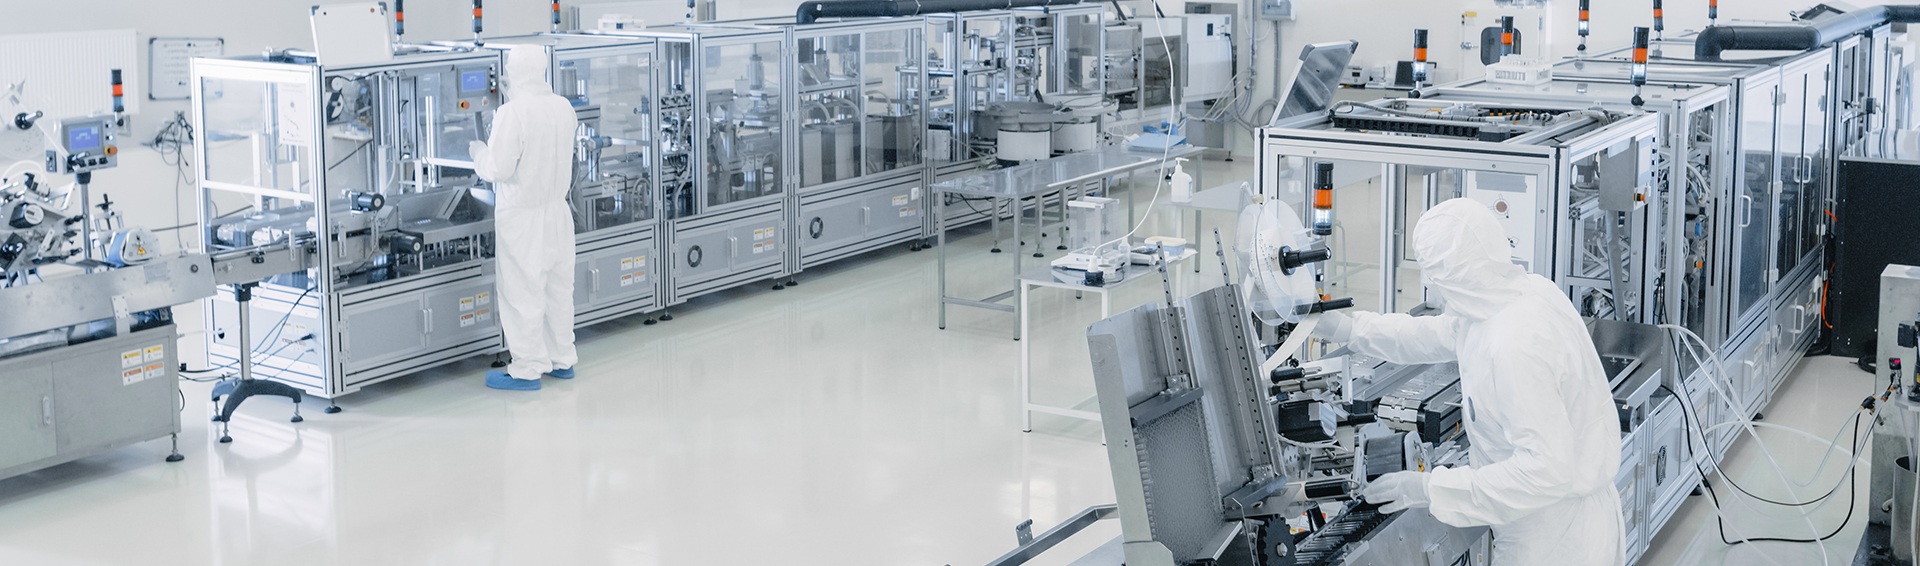 laboratories flooring